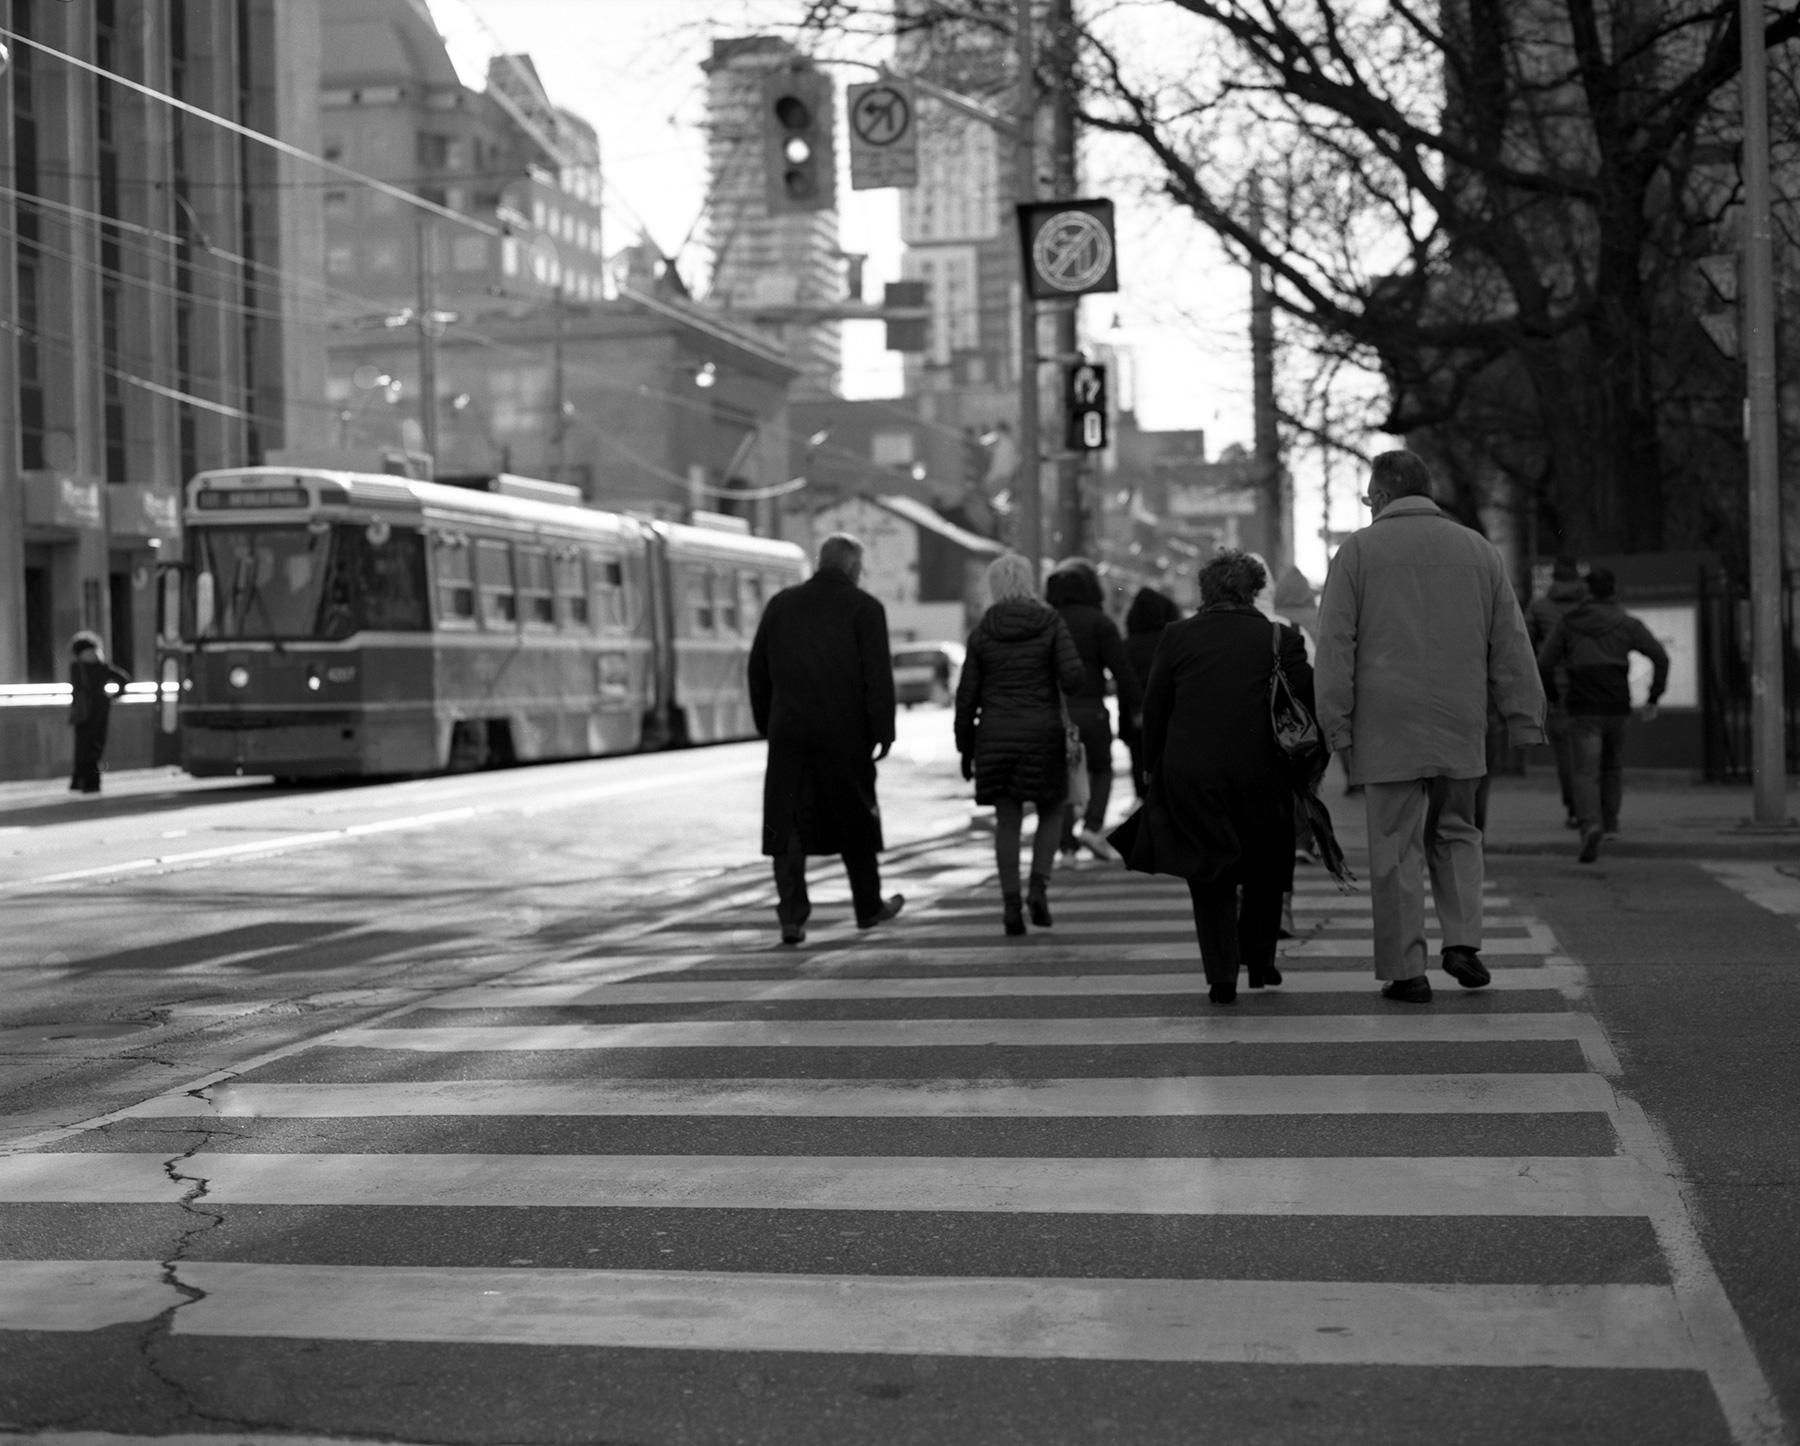 Ilford Delta Pro 100 Toronto Mamiya rz67 Photography